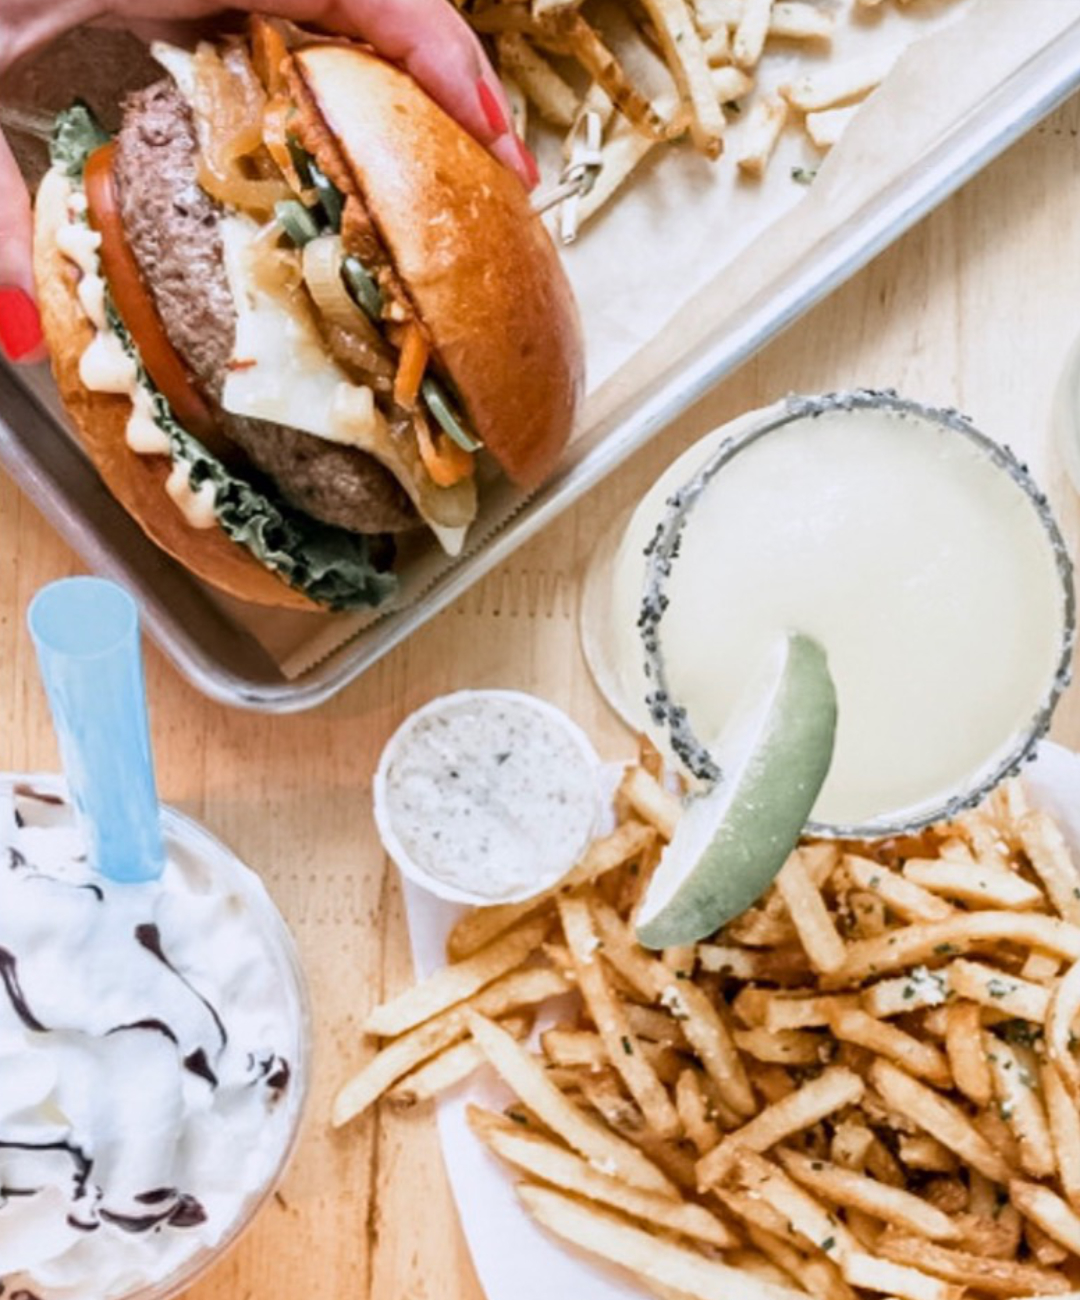 lauren_nicolle-austin-where-to-eat-burger